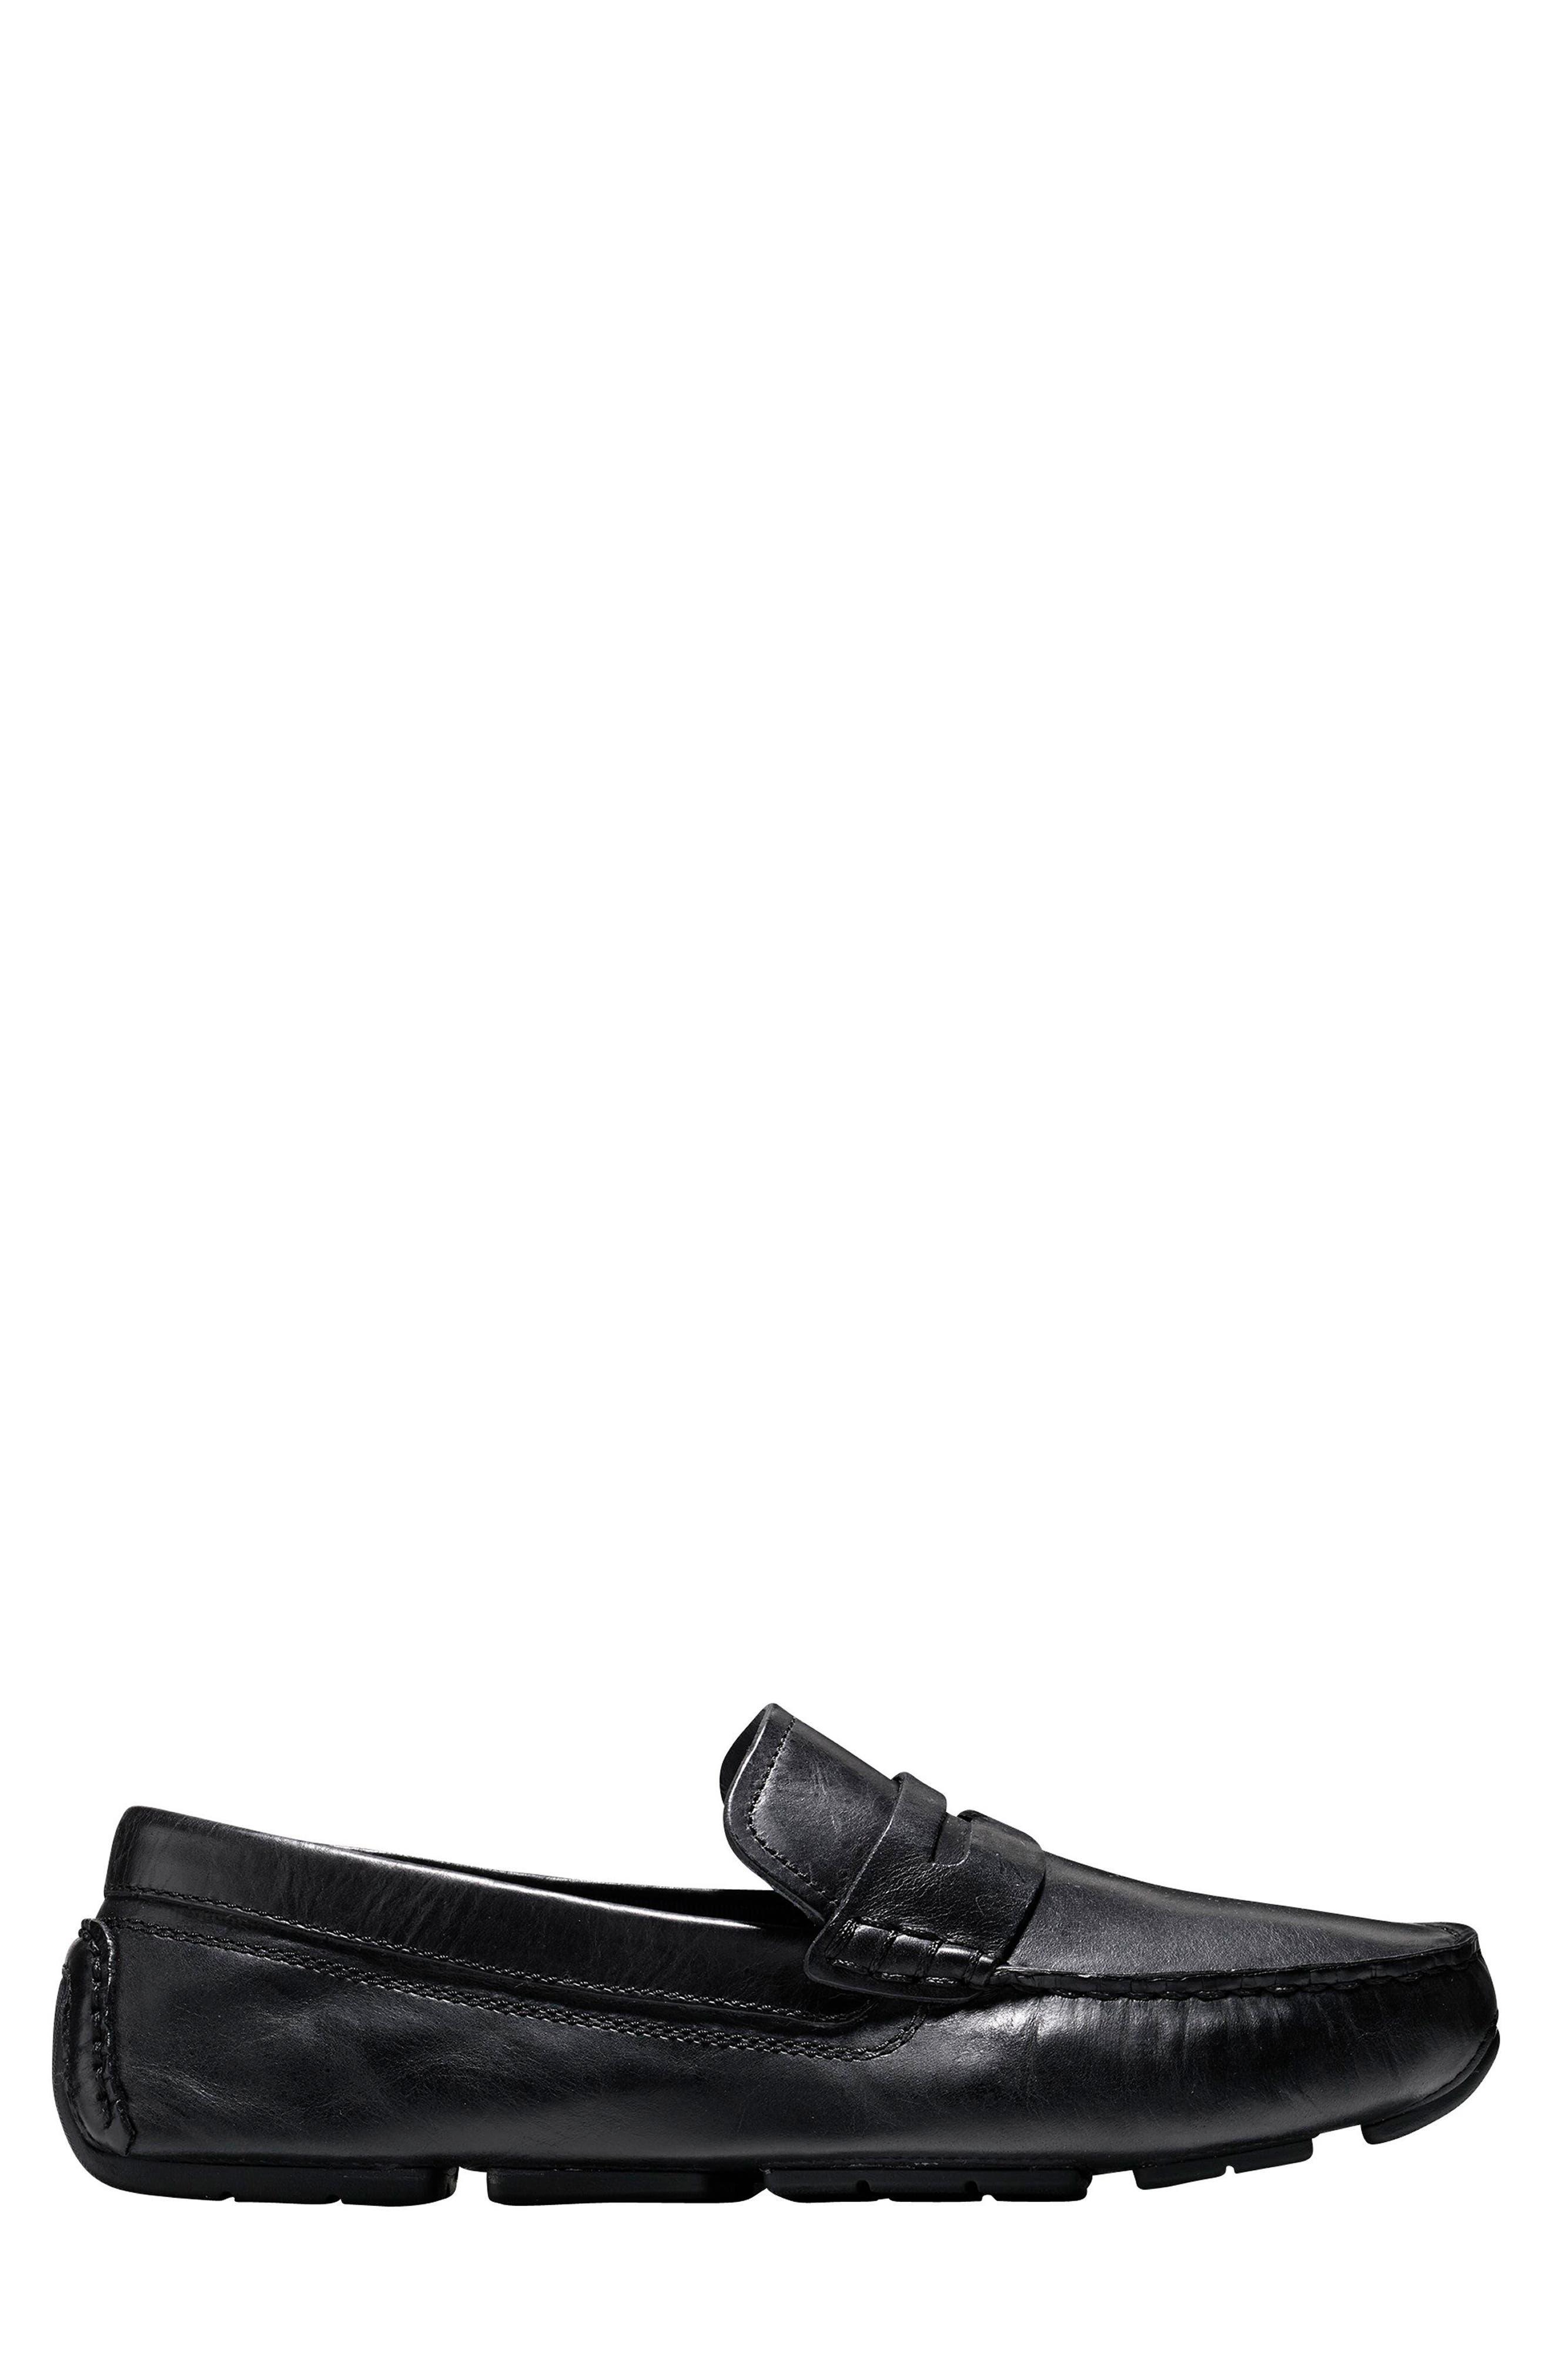 Kelson Driving Shoe,                             Alternate thumbnail 3, color,                             Black